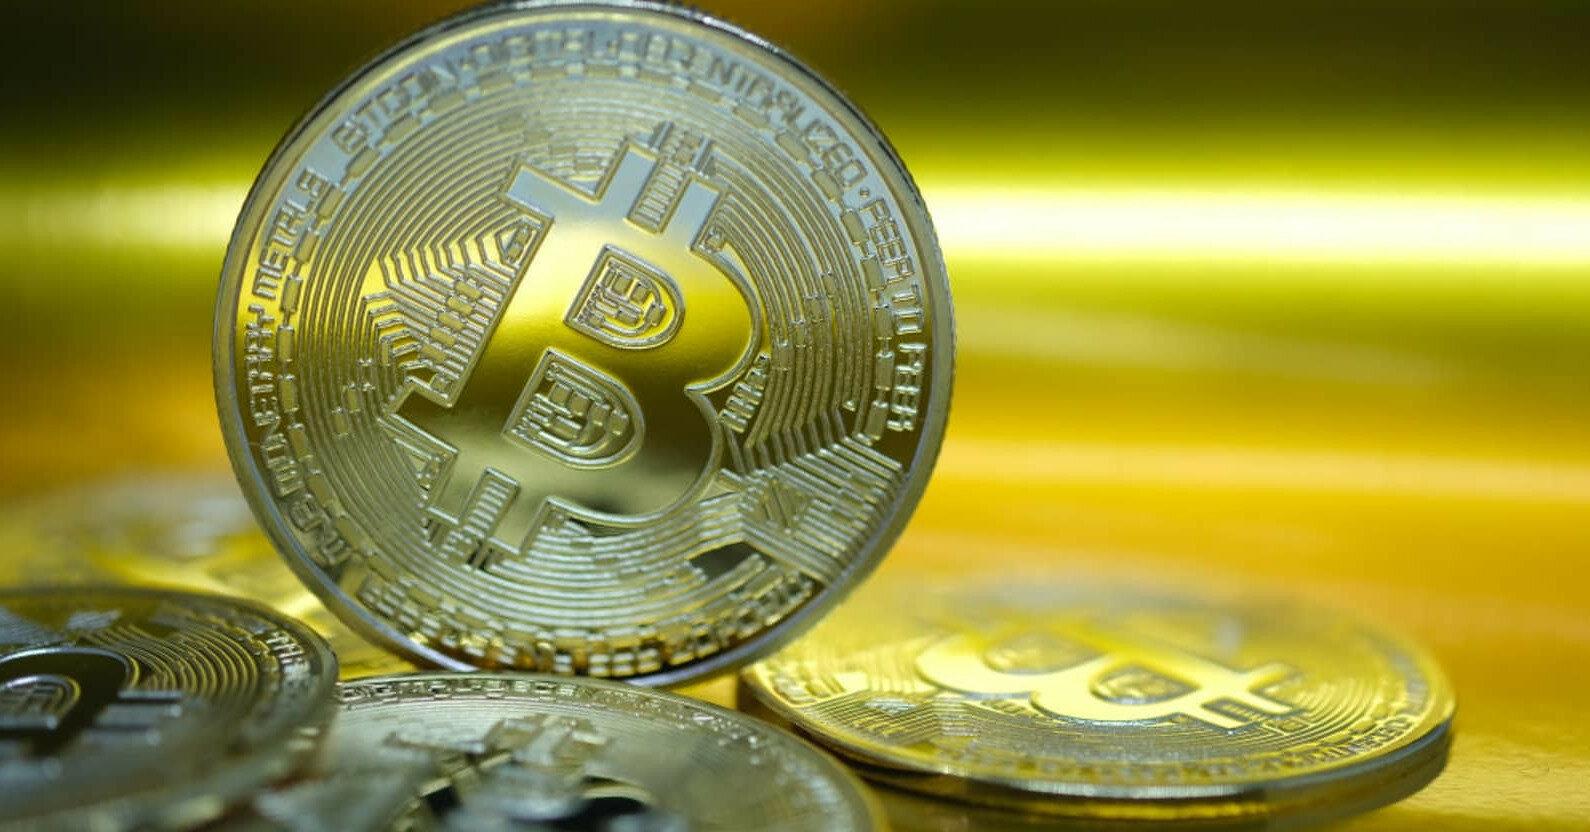 Глава центробанка Японии раскритиковал биткоин